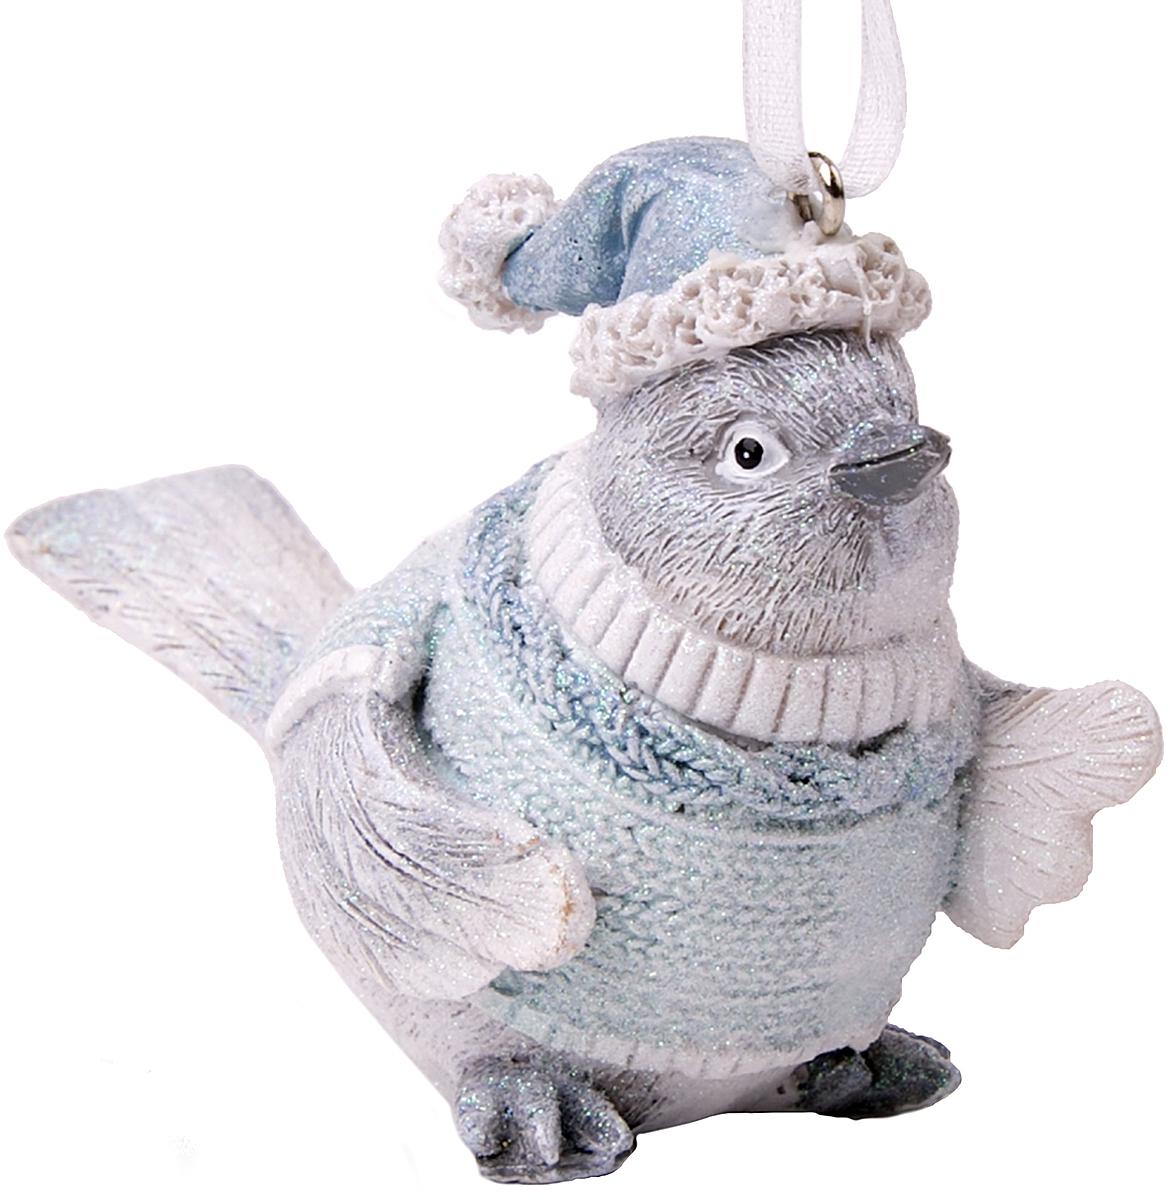 Украшение новогоднее подвесное Magic Time Птичка в голубом свитере. 7514275142Новогоднее подвесное украшение Птичка в голубом свитере из полирезины, 7,5х4х6, артикул 75142